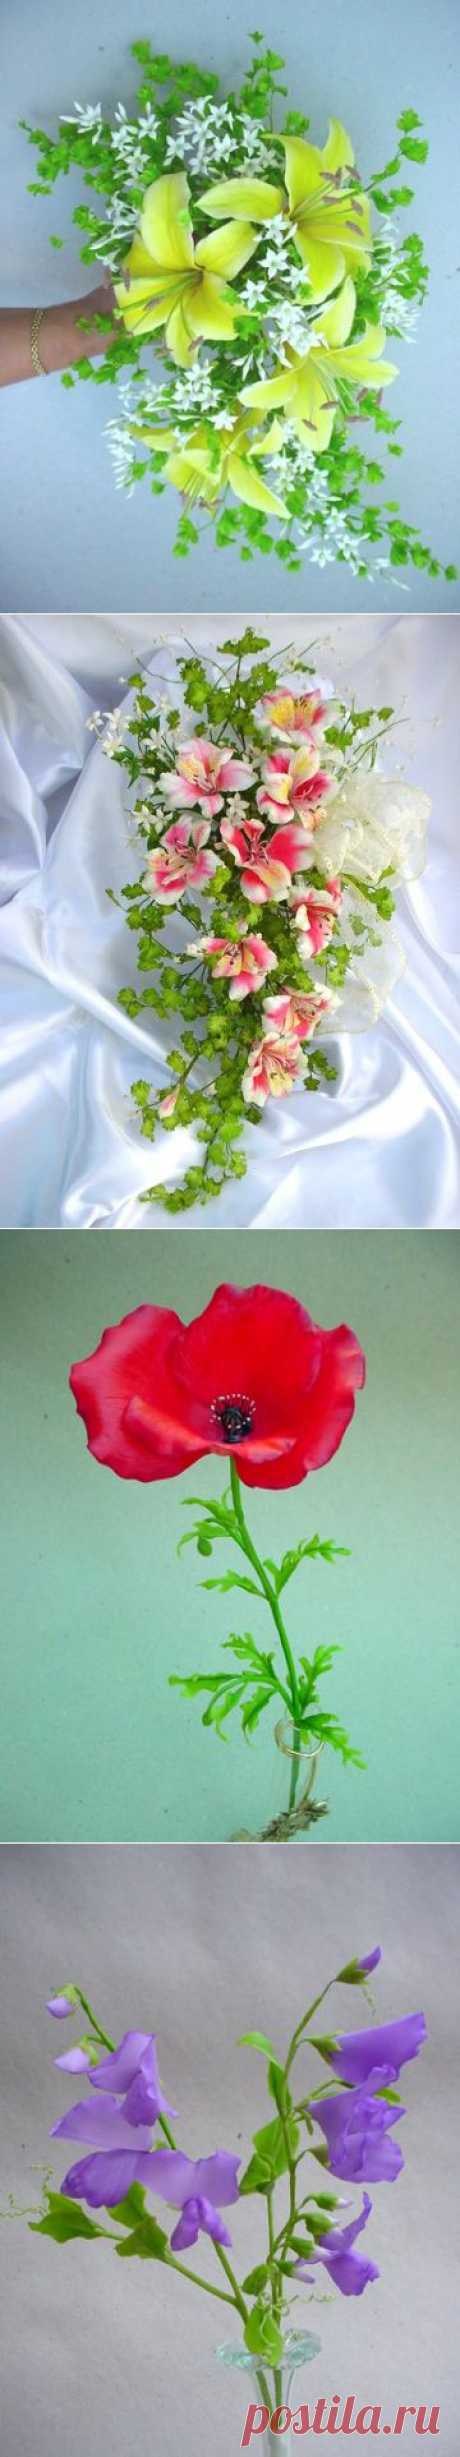 Рецепты холодного фарфора для лепки цветов.